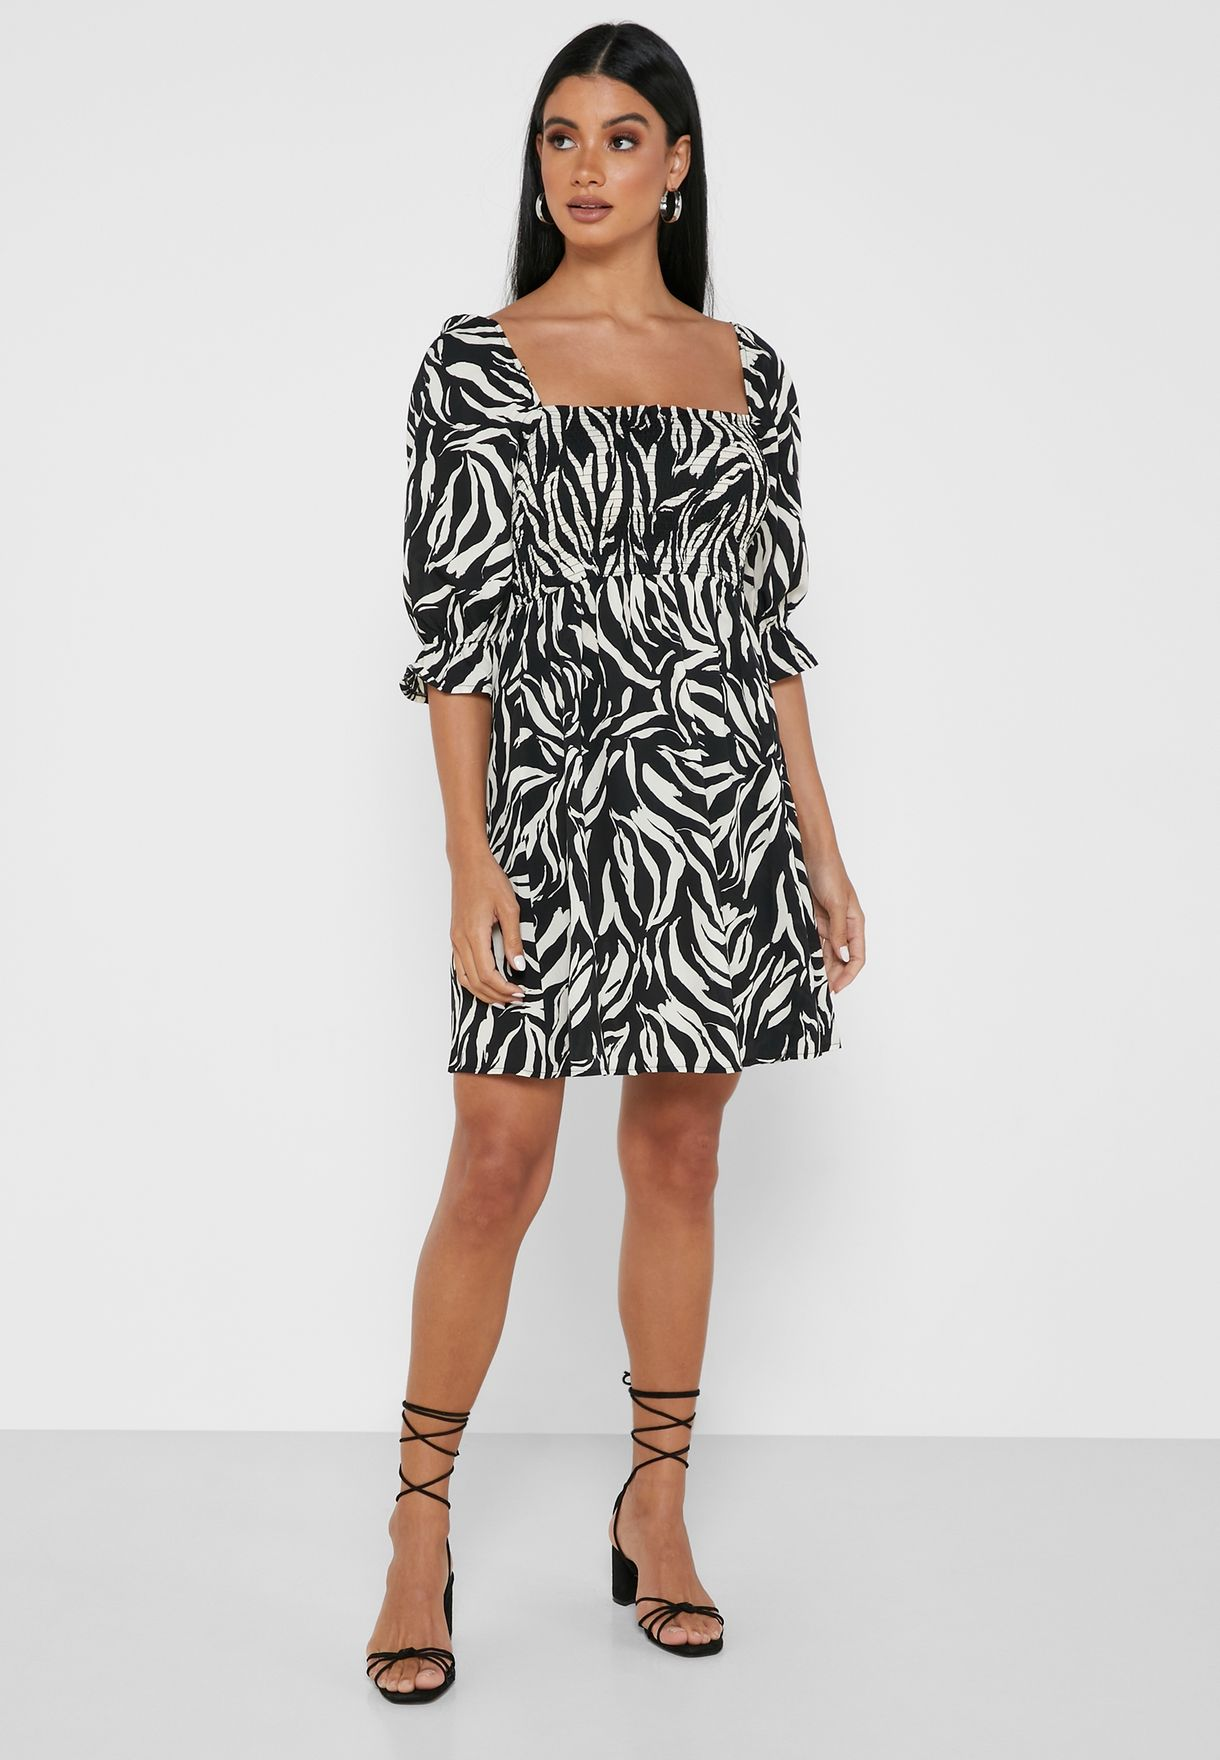 Collar Neck Printed Dress